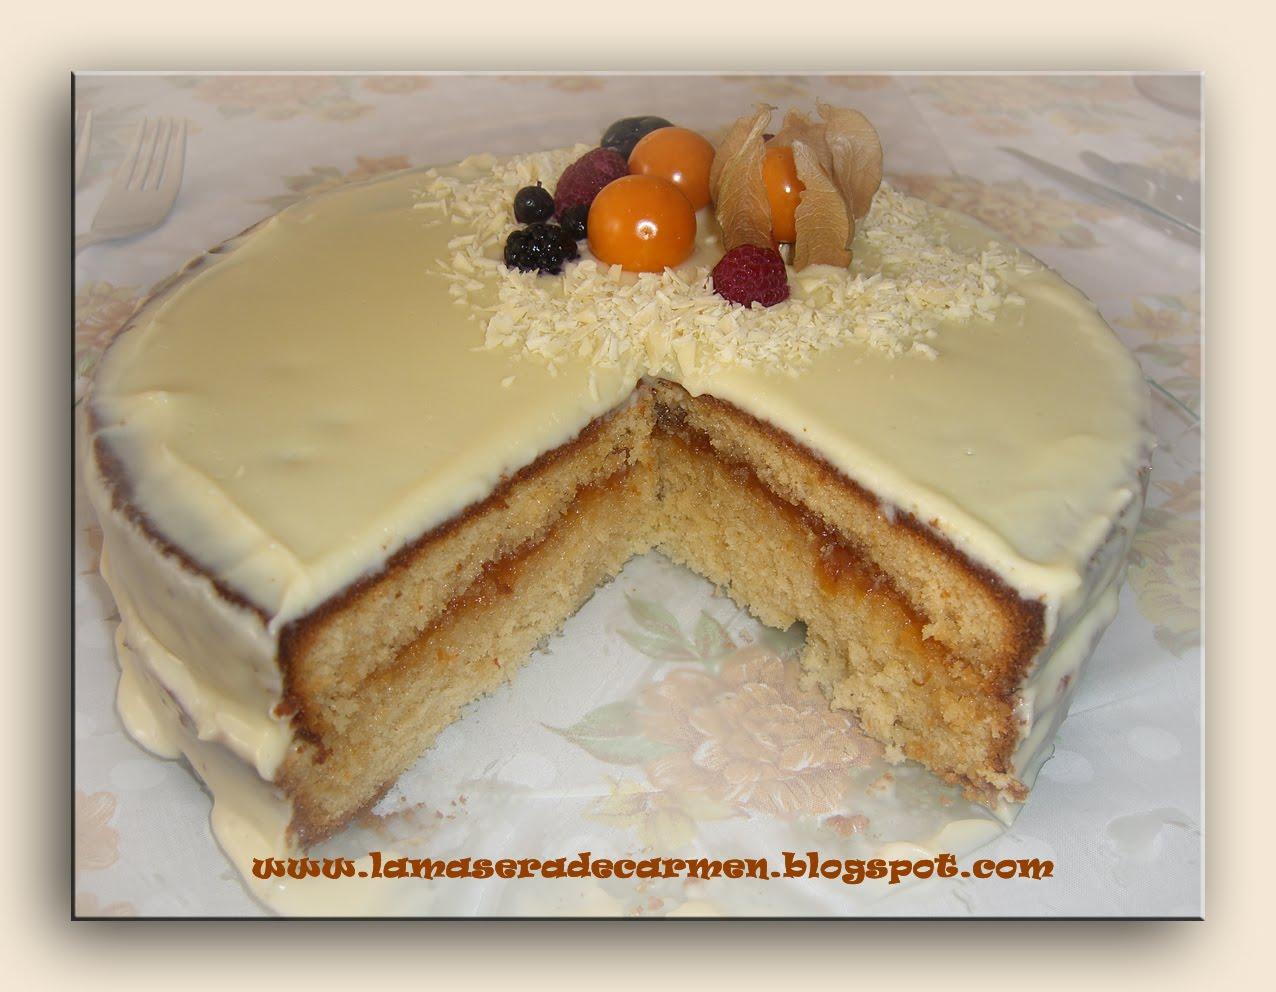 Baño Chocolate Blanco Para Tartas:La masera: Tarta de chocolate blanco y yogur